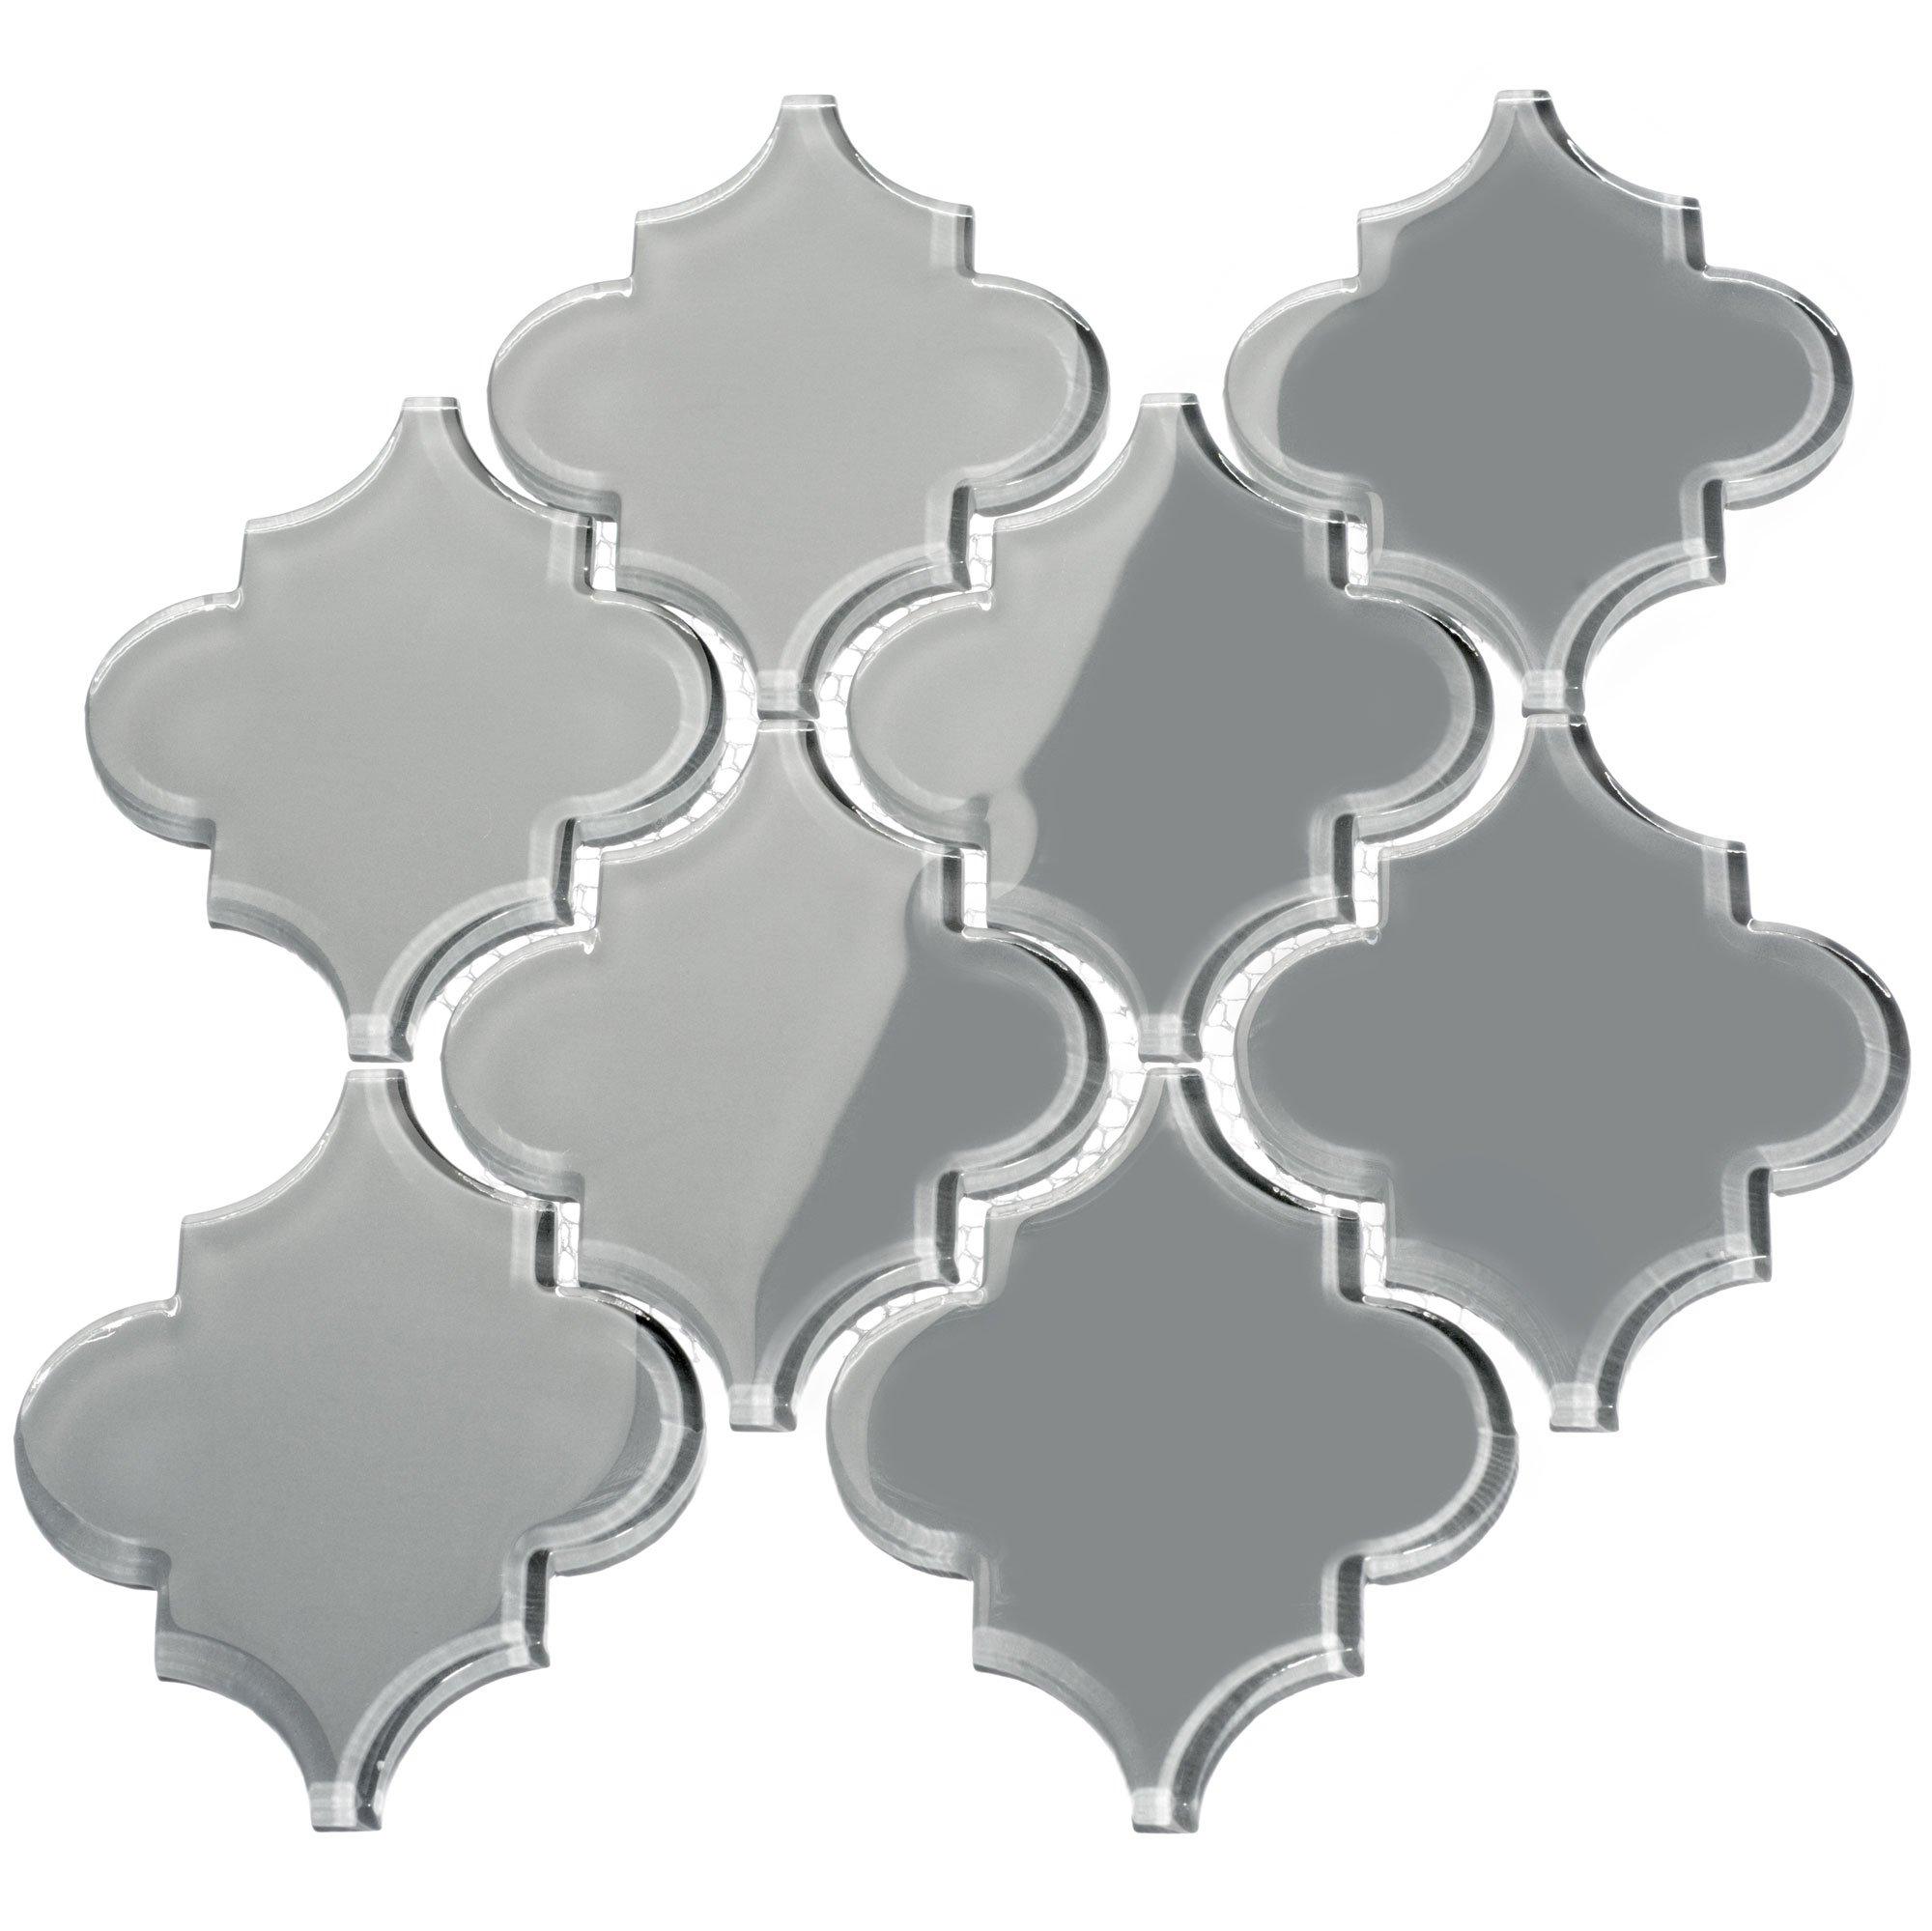 Giorbello G9132 Glass Arabesque Tile, True Gray